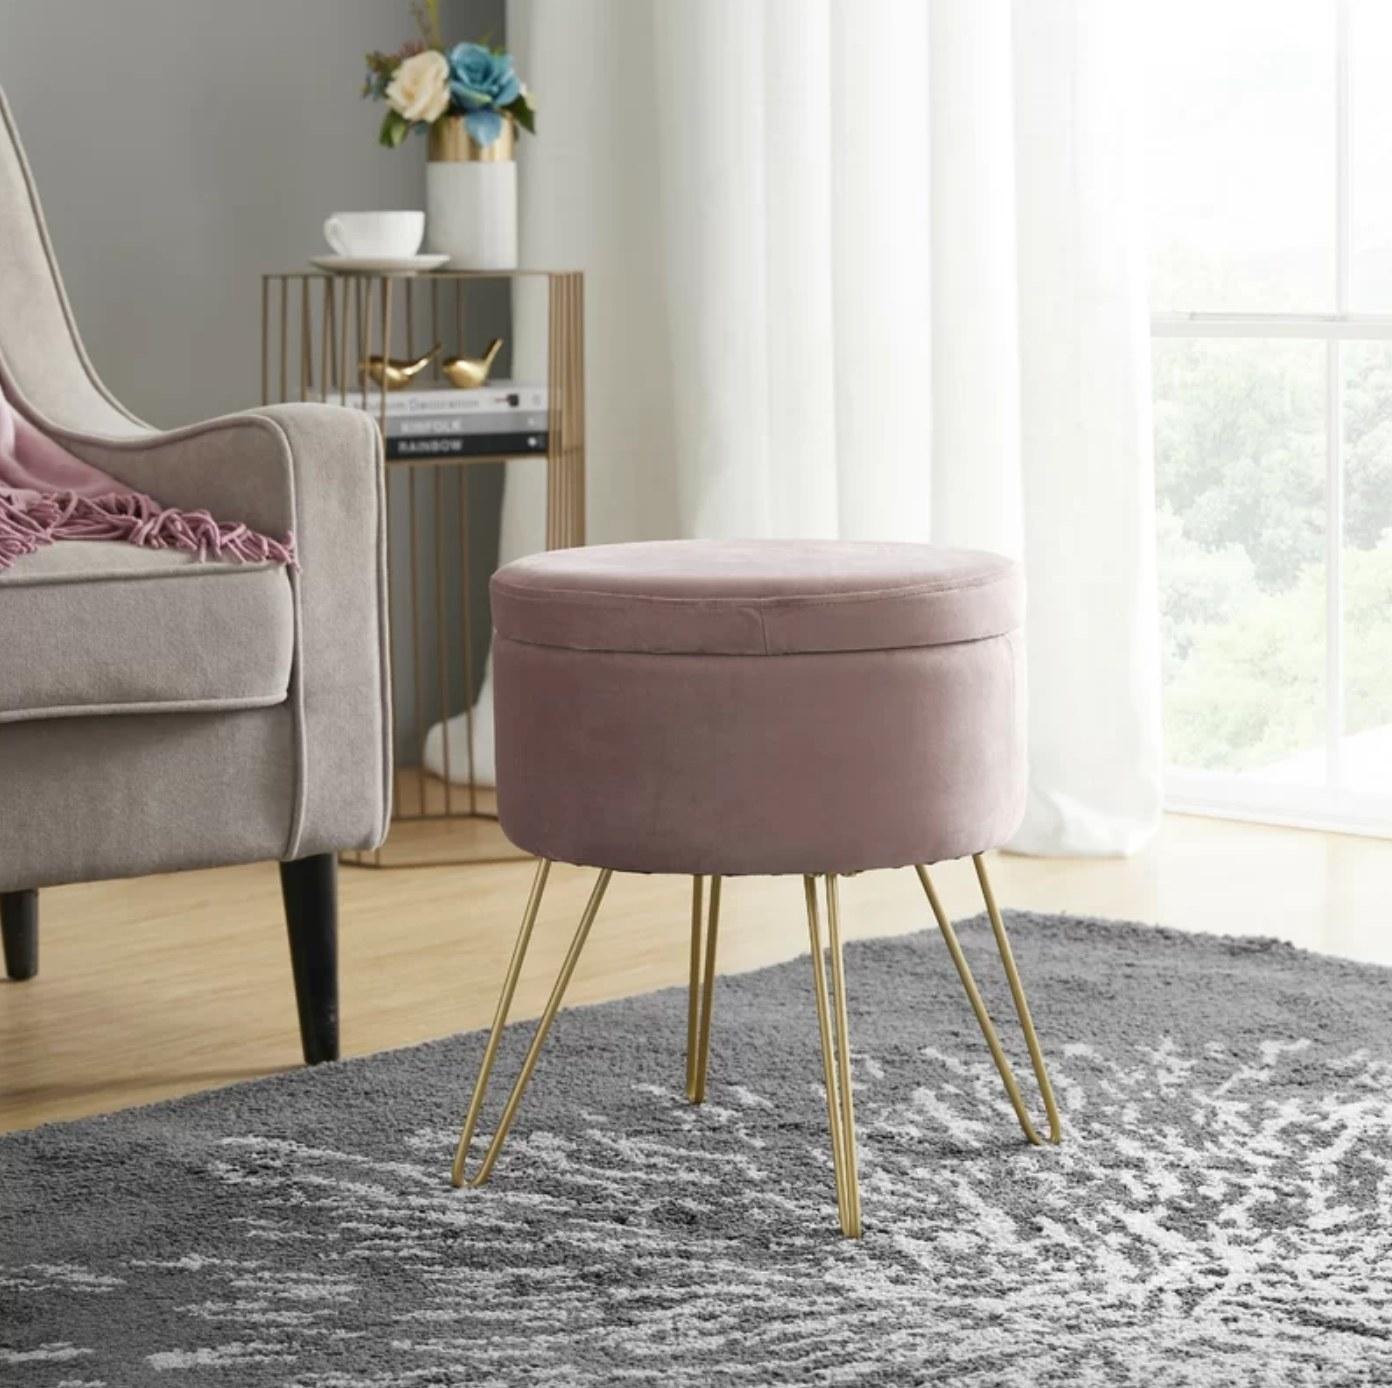 The velvet storage ottoman in blush